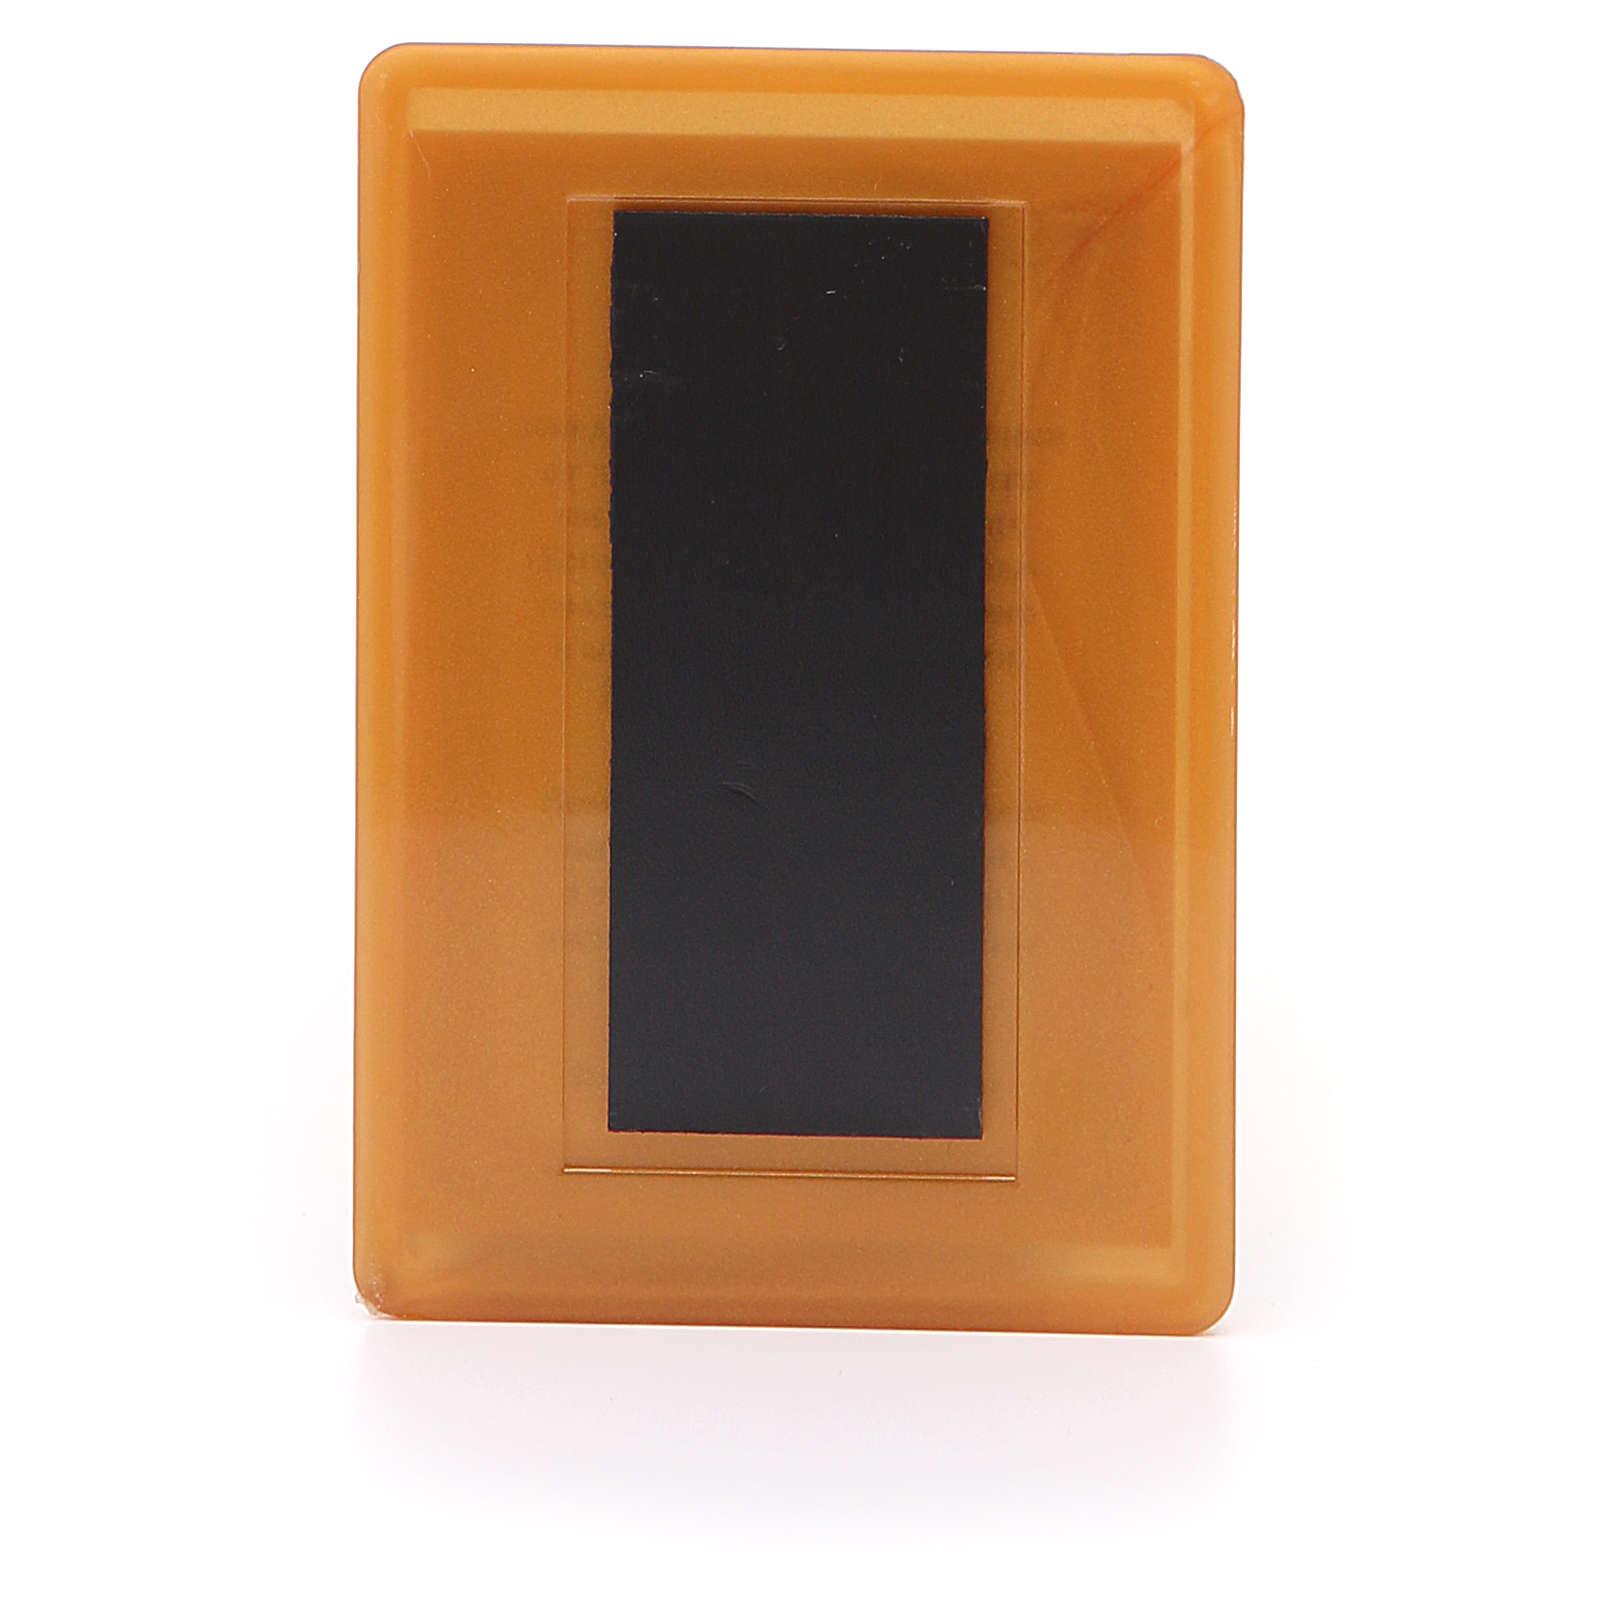 Magnet plexiglass russian Vladimirskaya 10x7cm 3